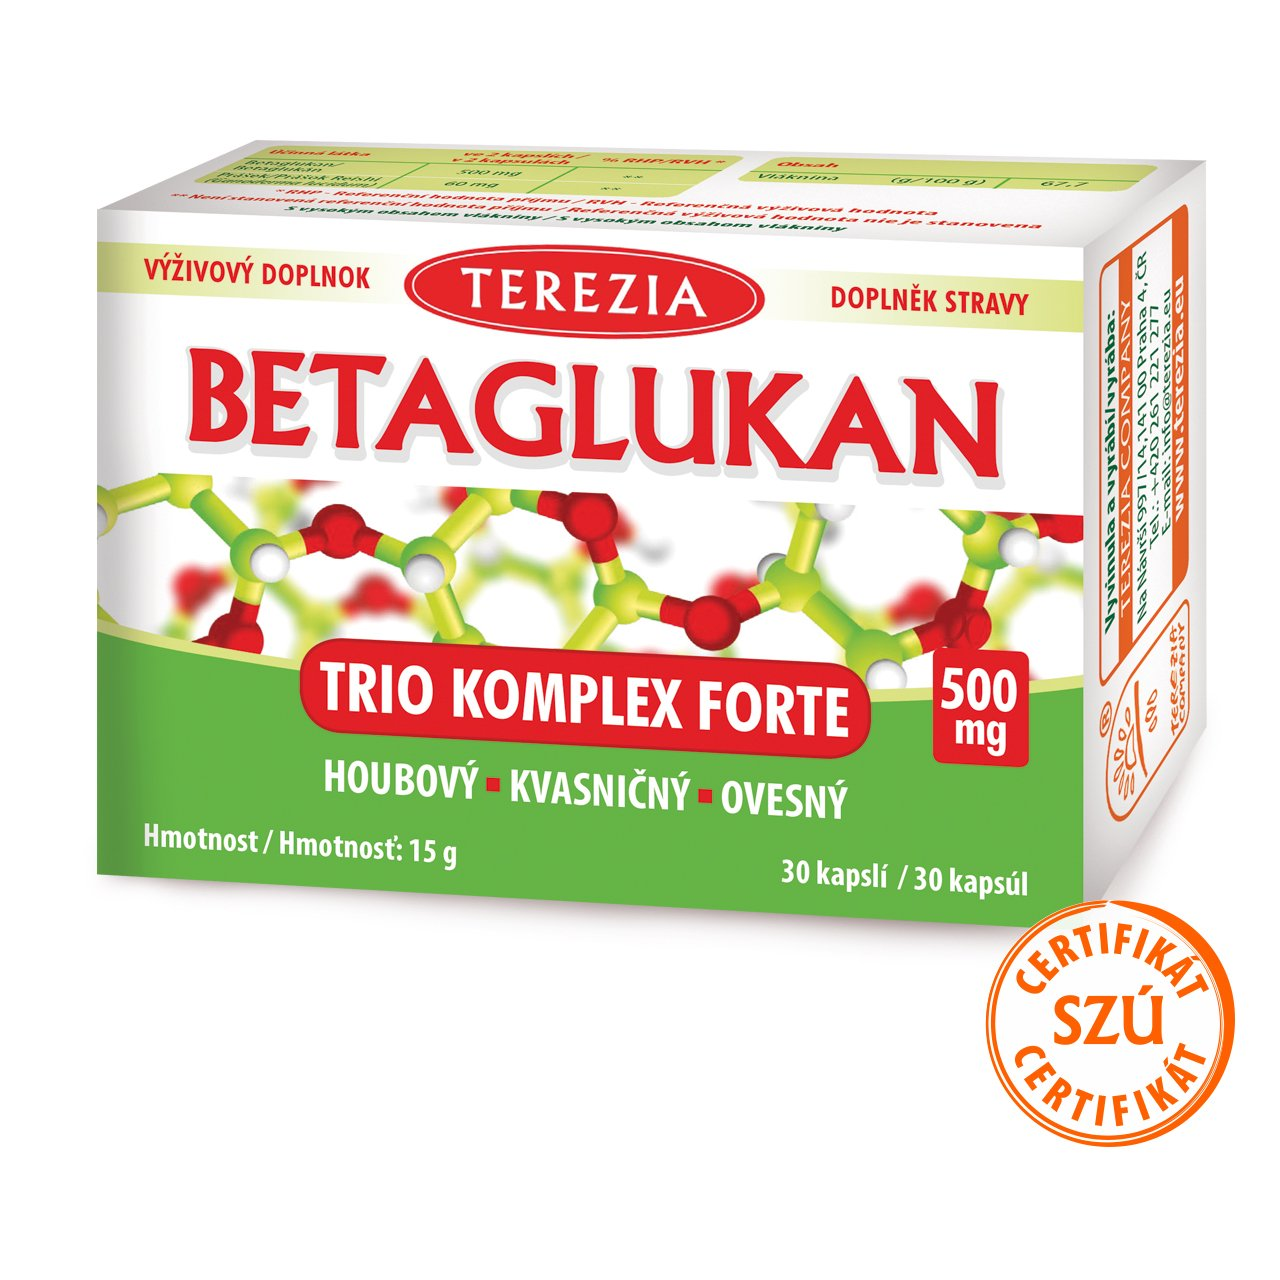 Levně BETAGLUKAN Trio Komplex Forte 500 mg